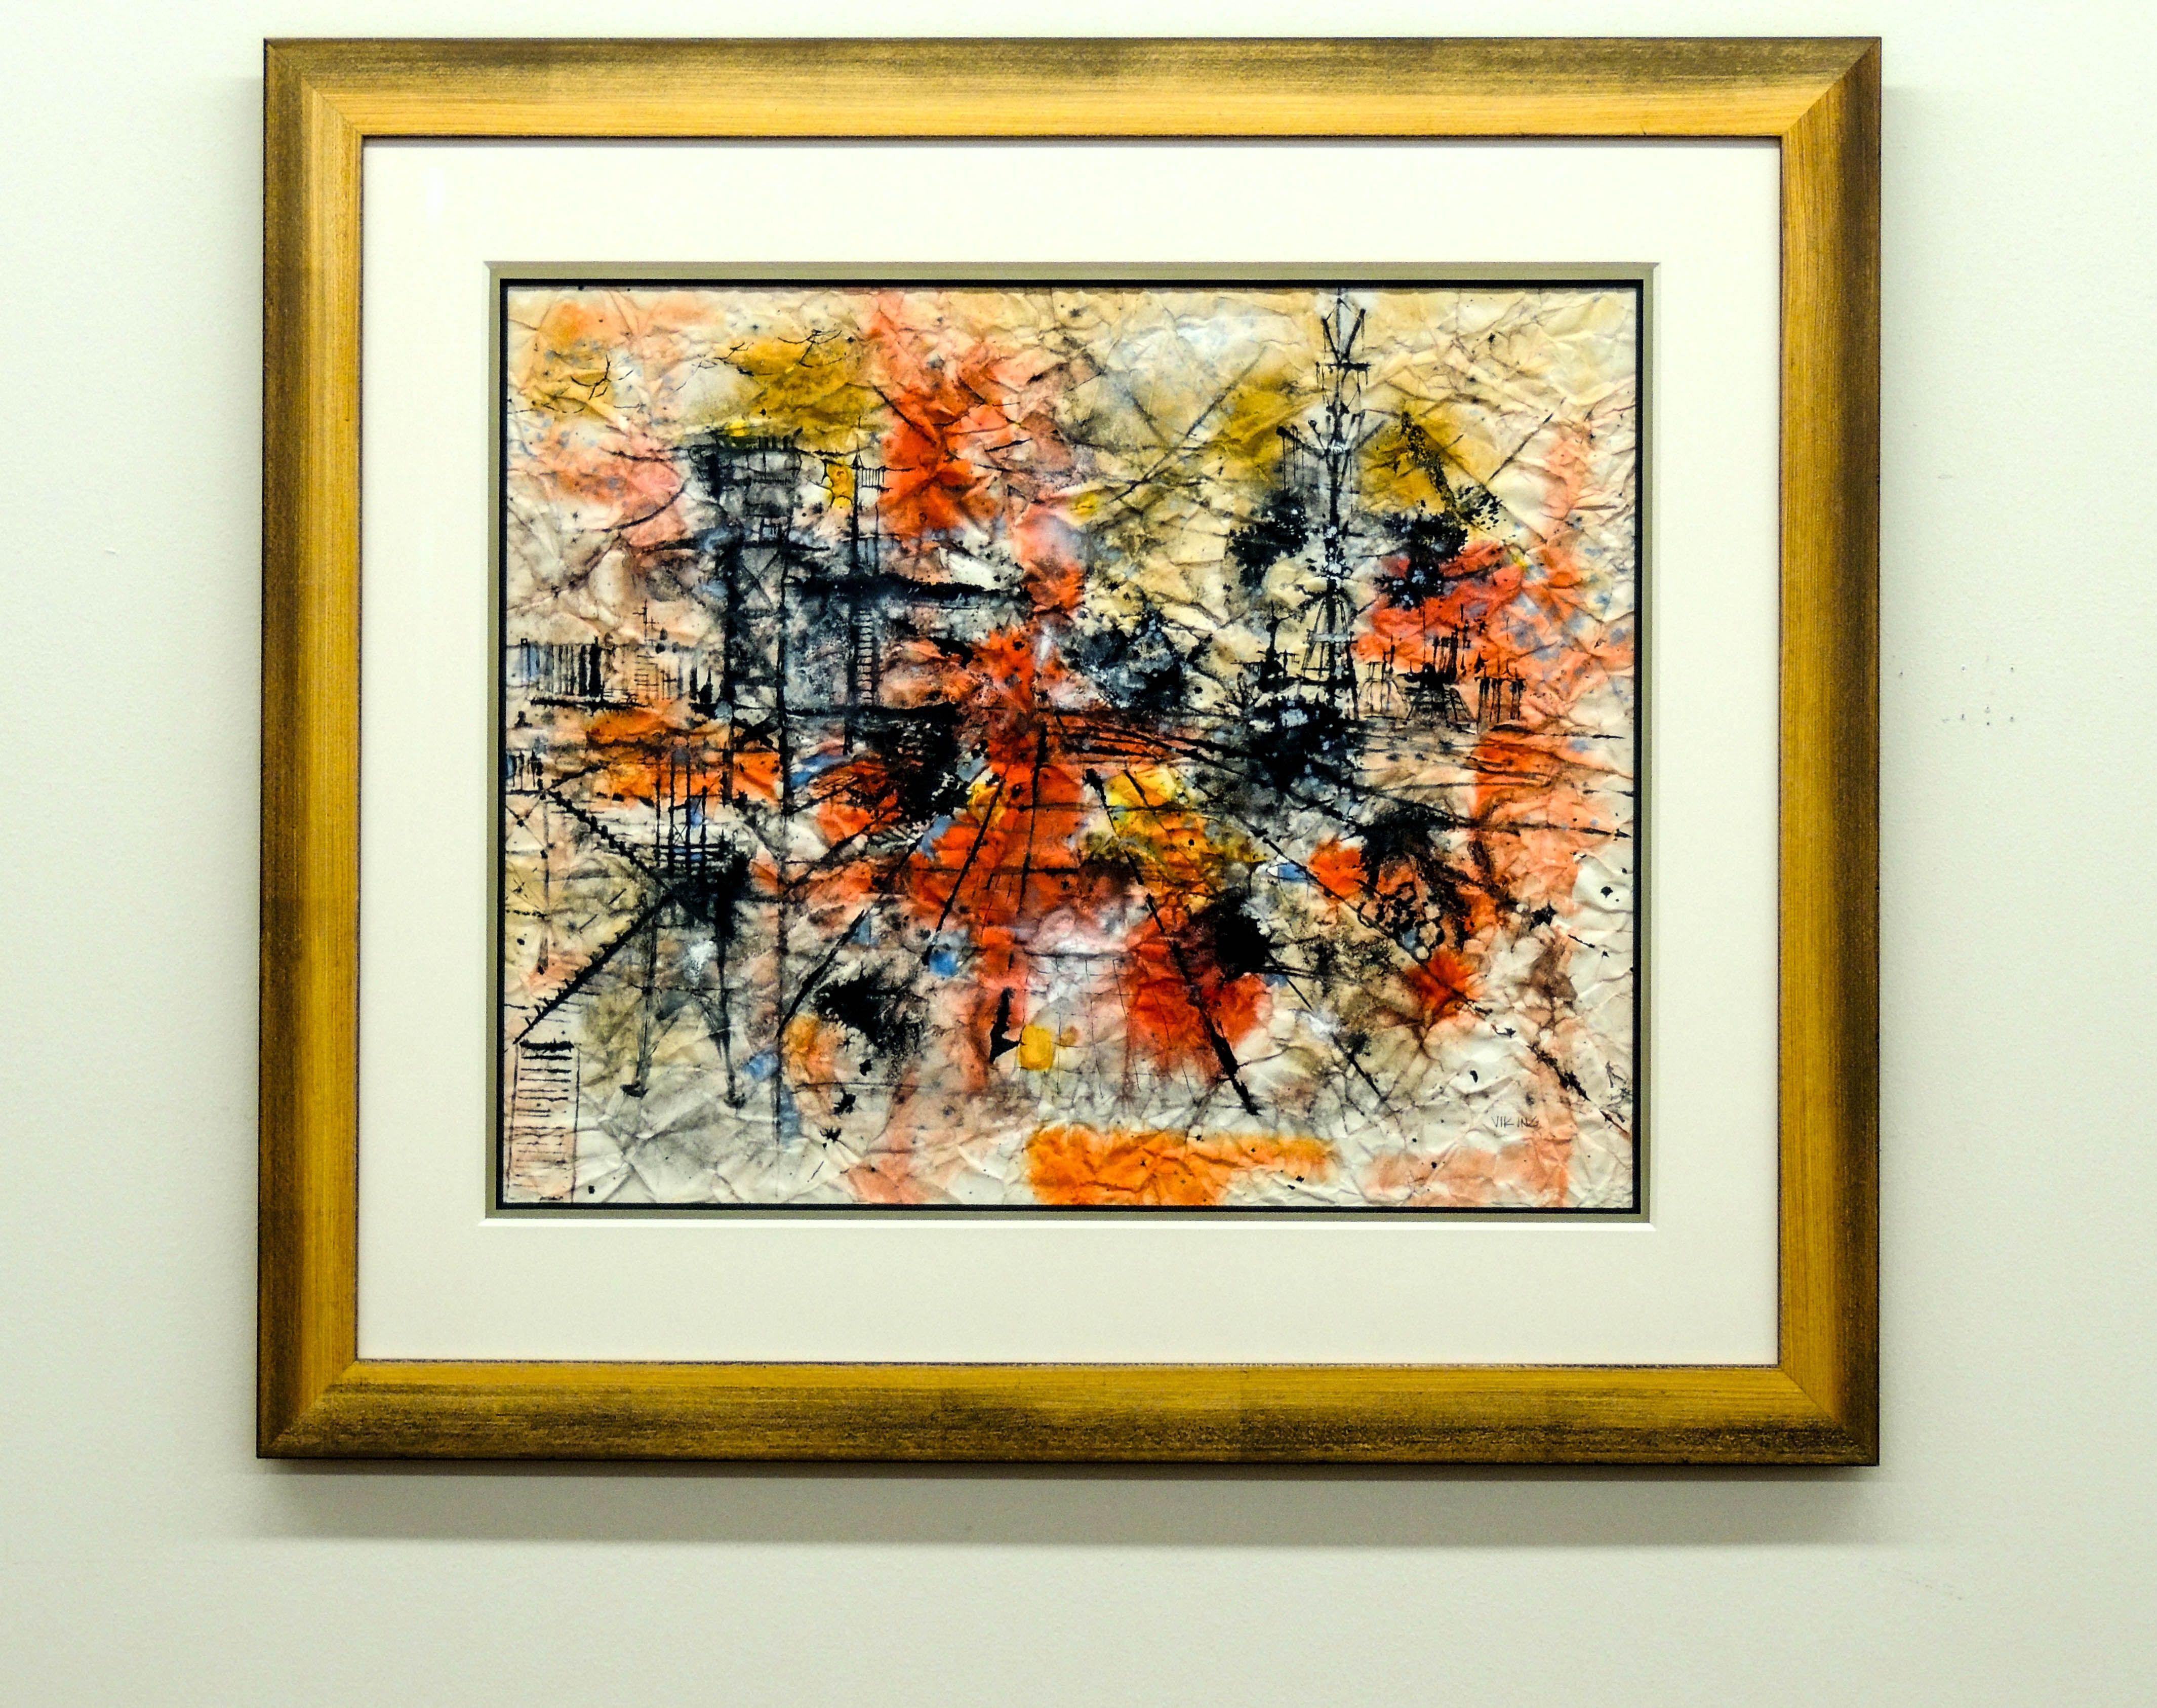 Pin by AUM Framing & Gallery on Custom Framing at AUM Framing of ...